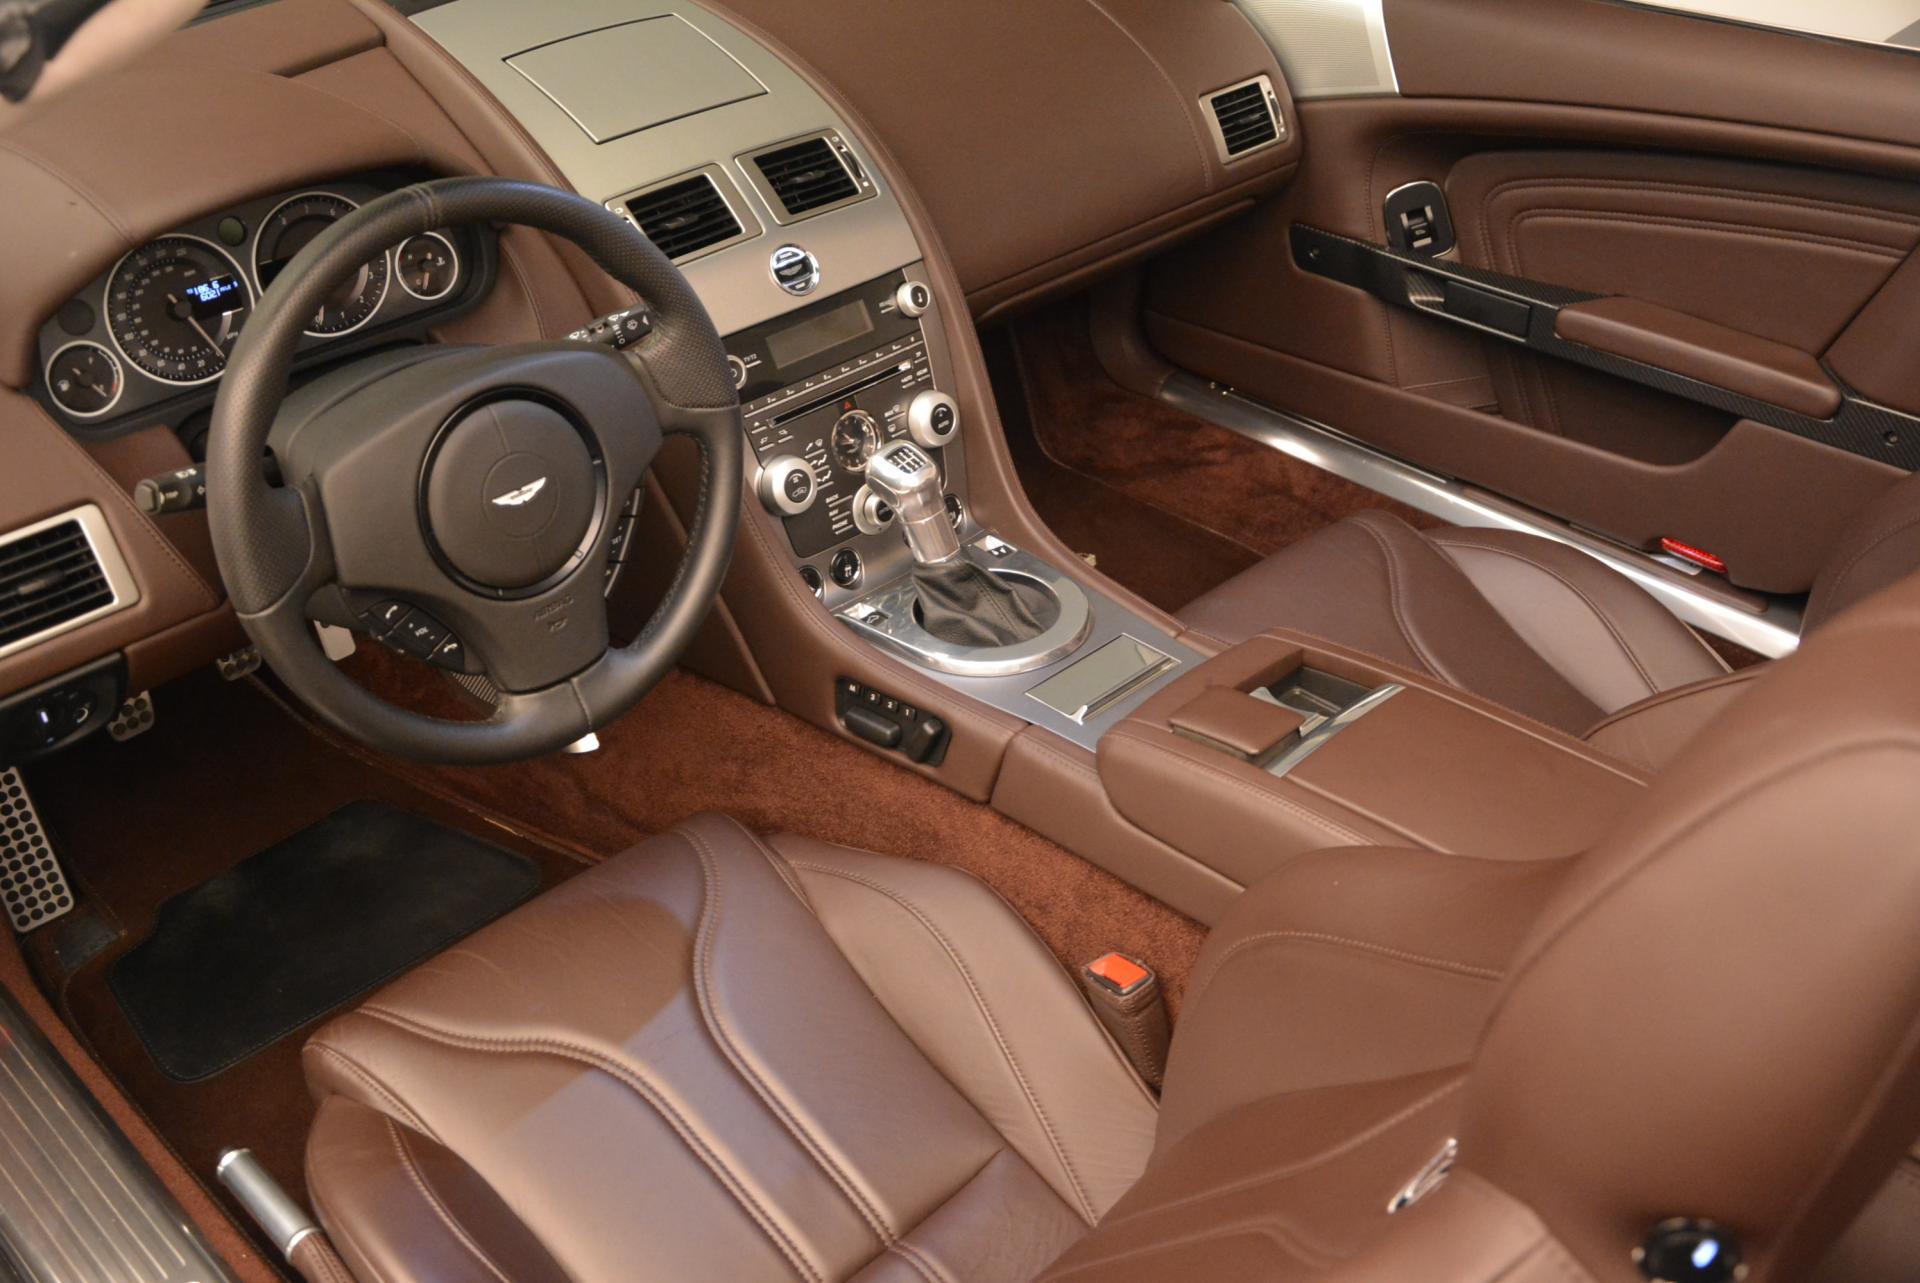 Used 2010 Aston Martin DBS Volante For Sale In Greenwich, CT 87_p27